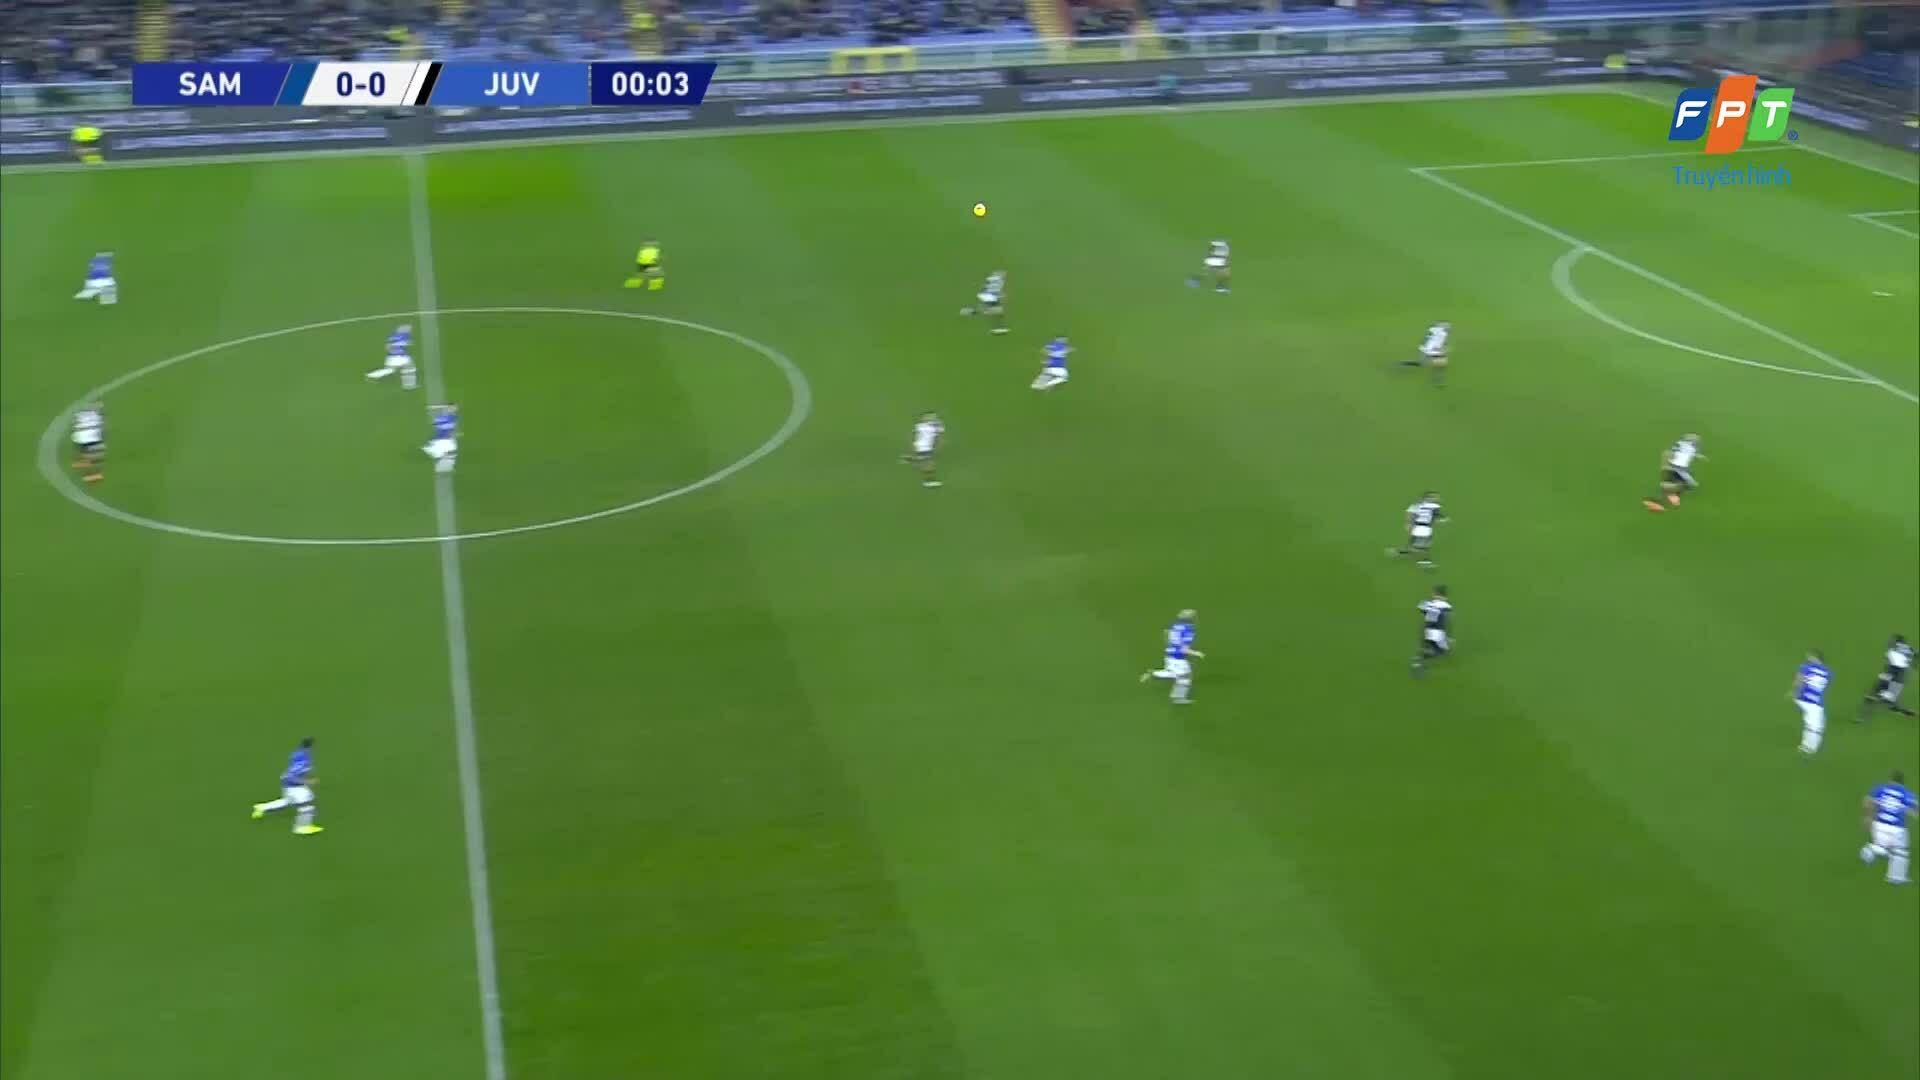 Sampdoria 1-2 Juventus